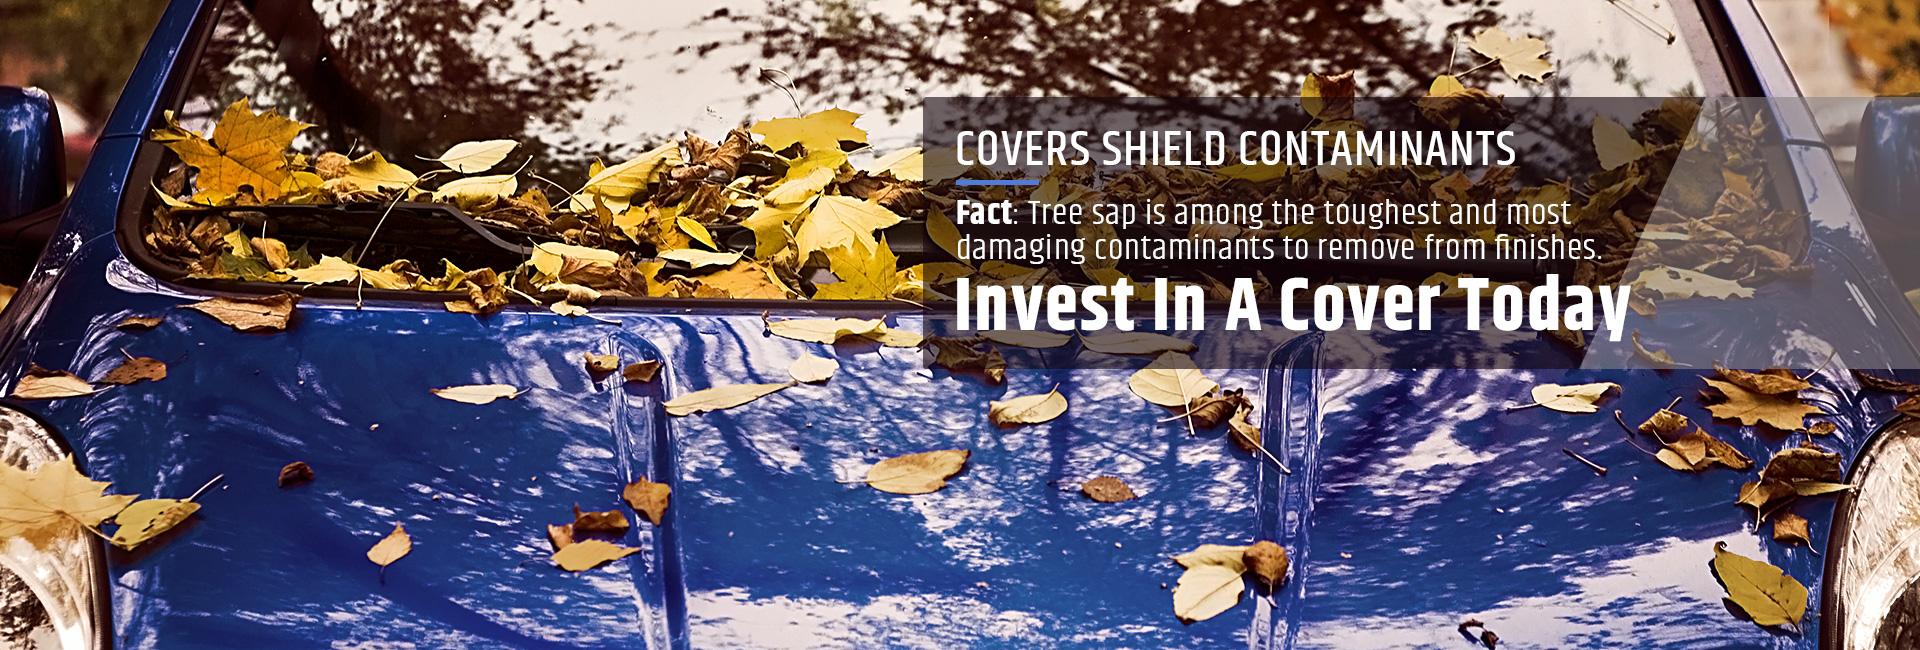 Covers shield contaminants